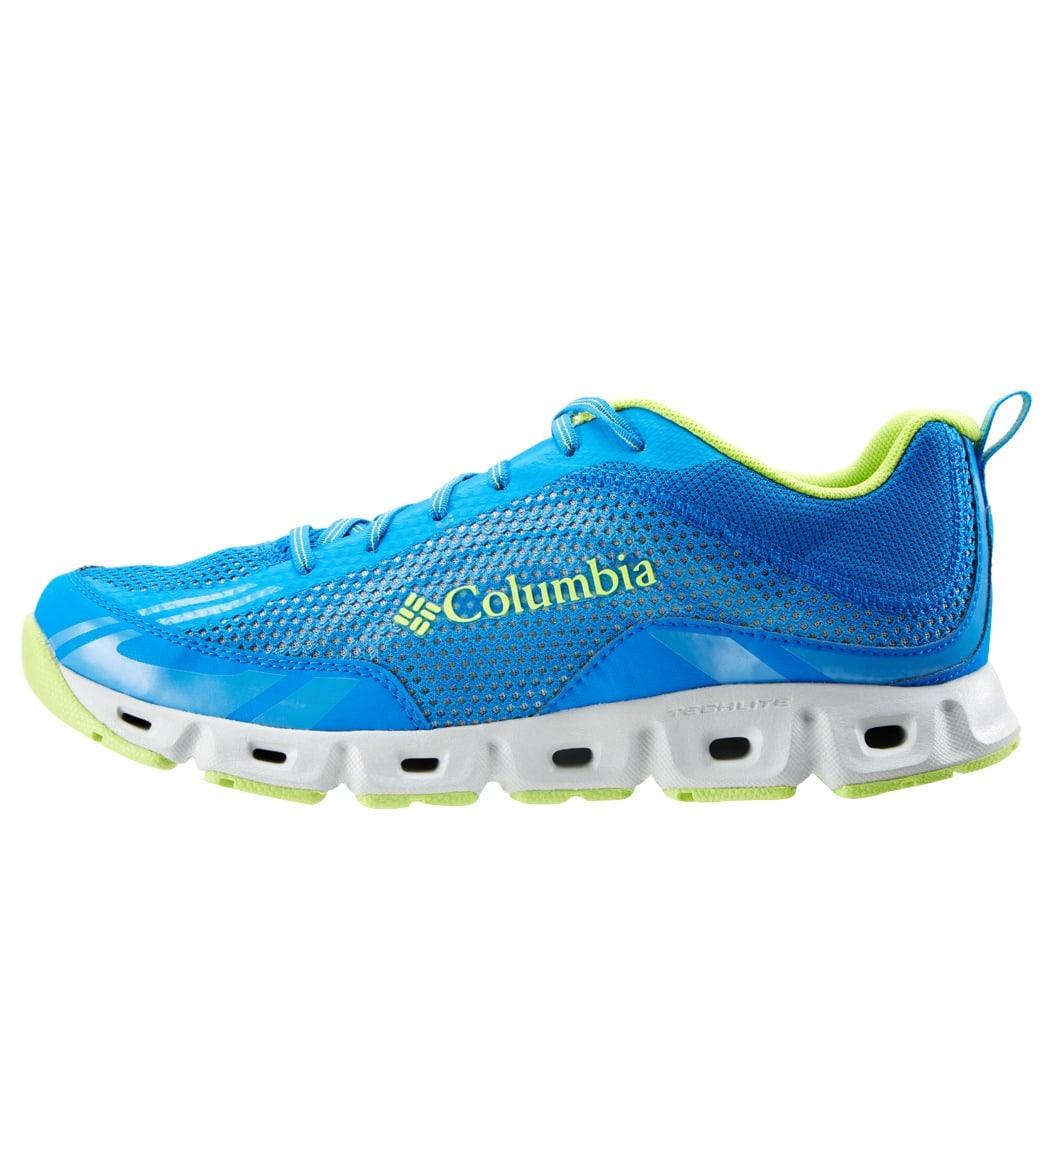 98d622d90a39 Columbia Men s Drainmaker IV Hybrid Shoe at SwimOutlet.com - Free ...